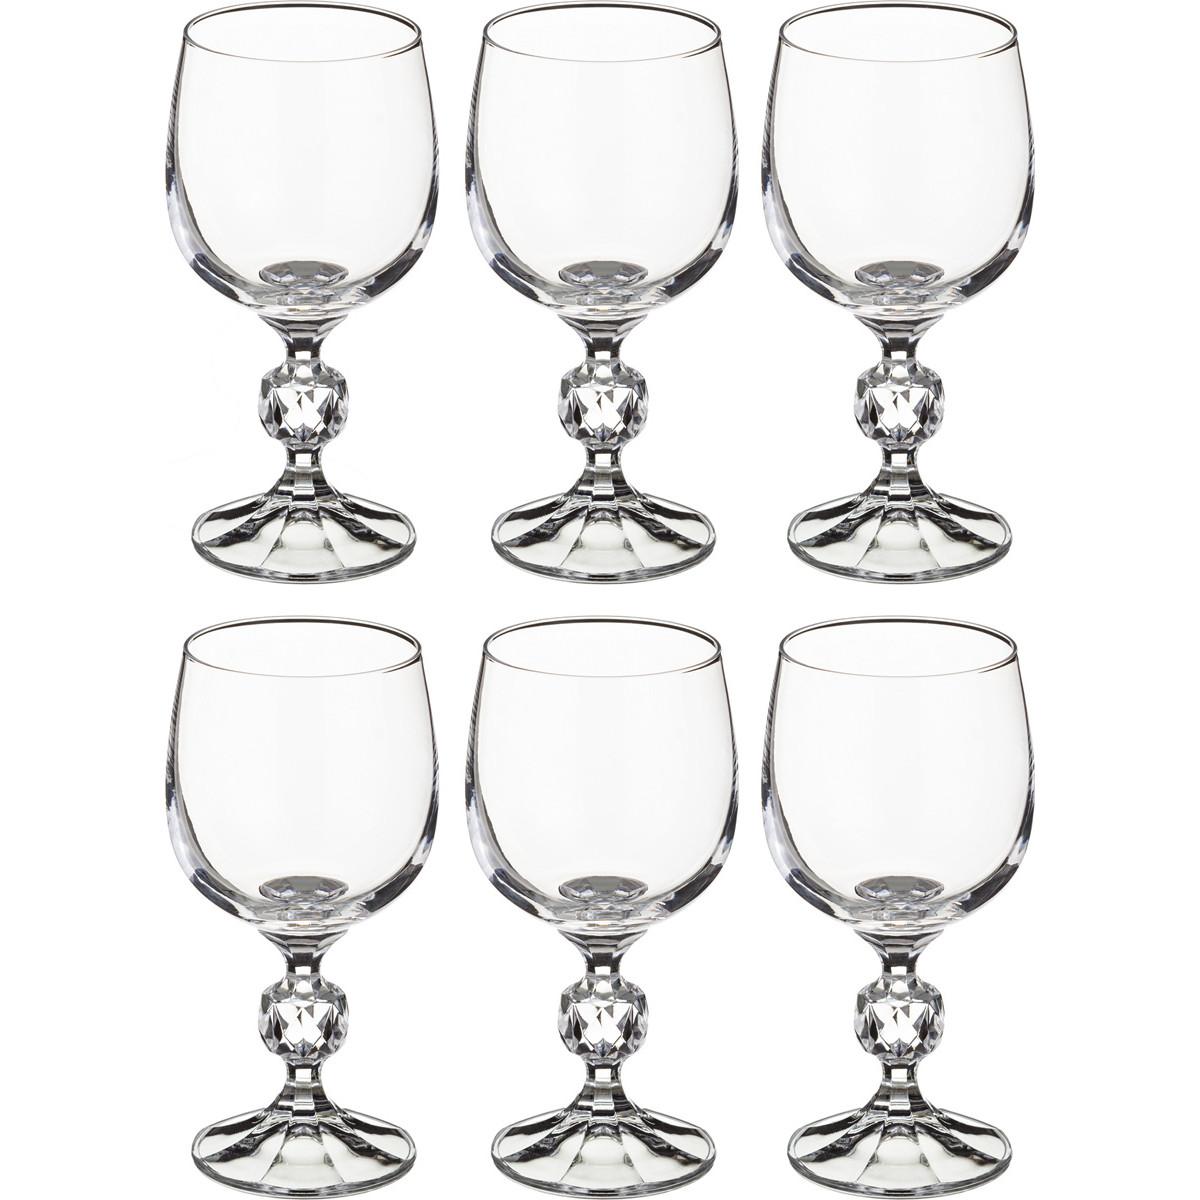 {} Crystalite Bohemia Набор бокалов для вина Joahaz (15 см - 6 шт) набор бокалов для бренди 6 шт crystalite bohemia набор бокалов для бренди 6 шт